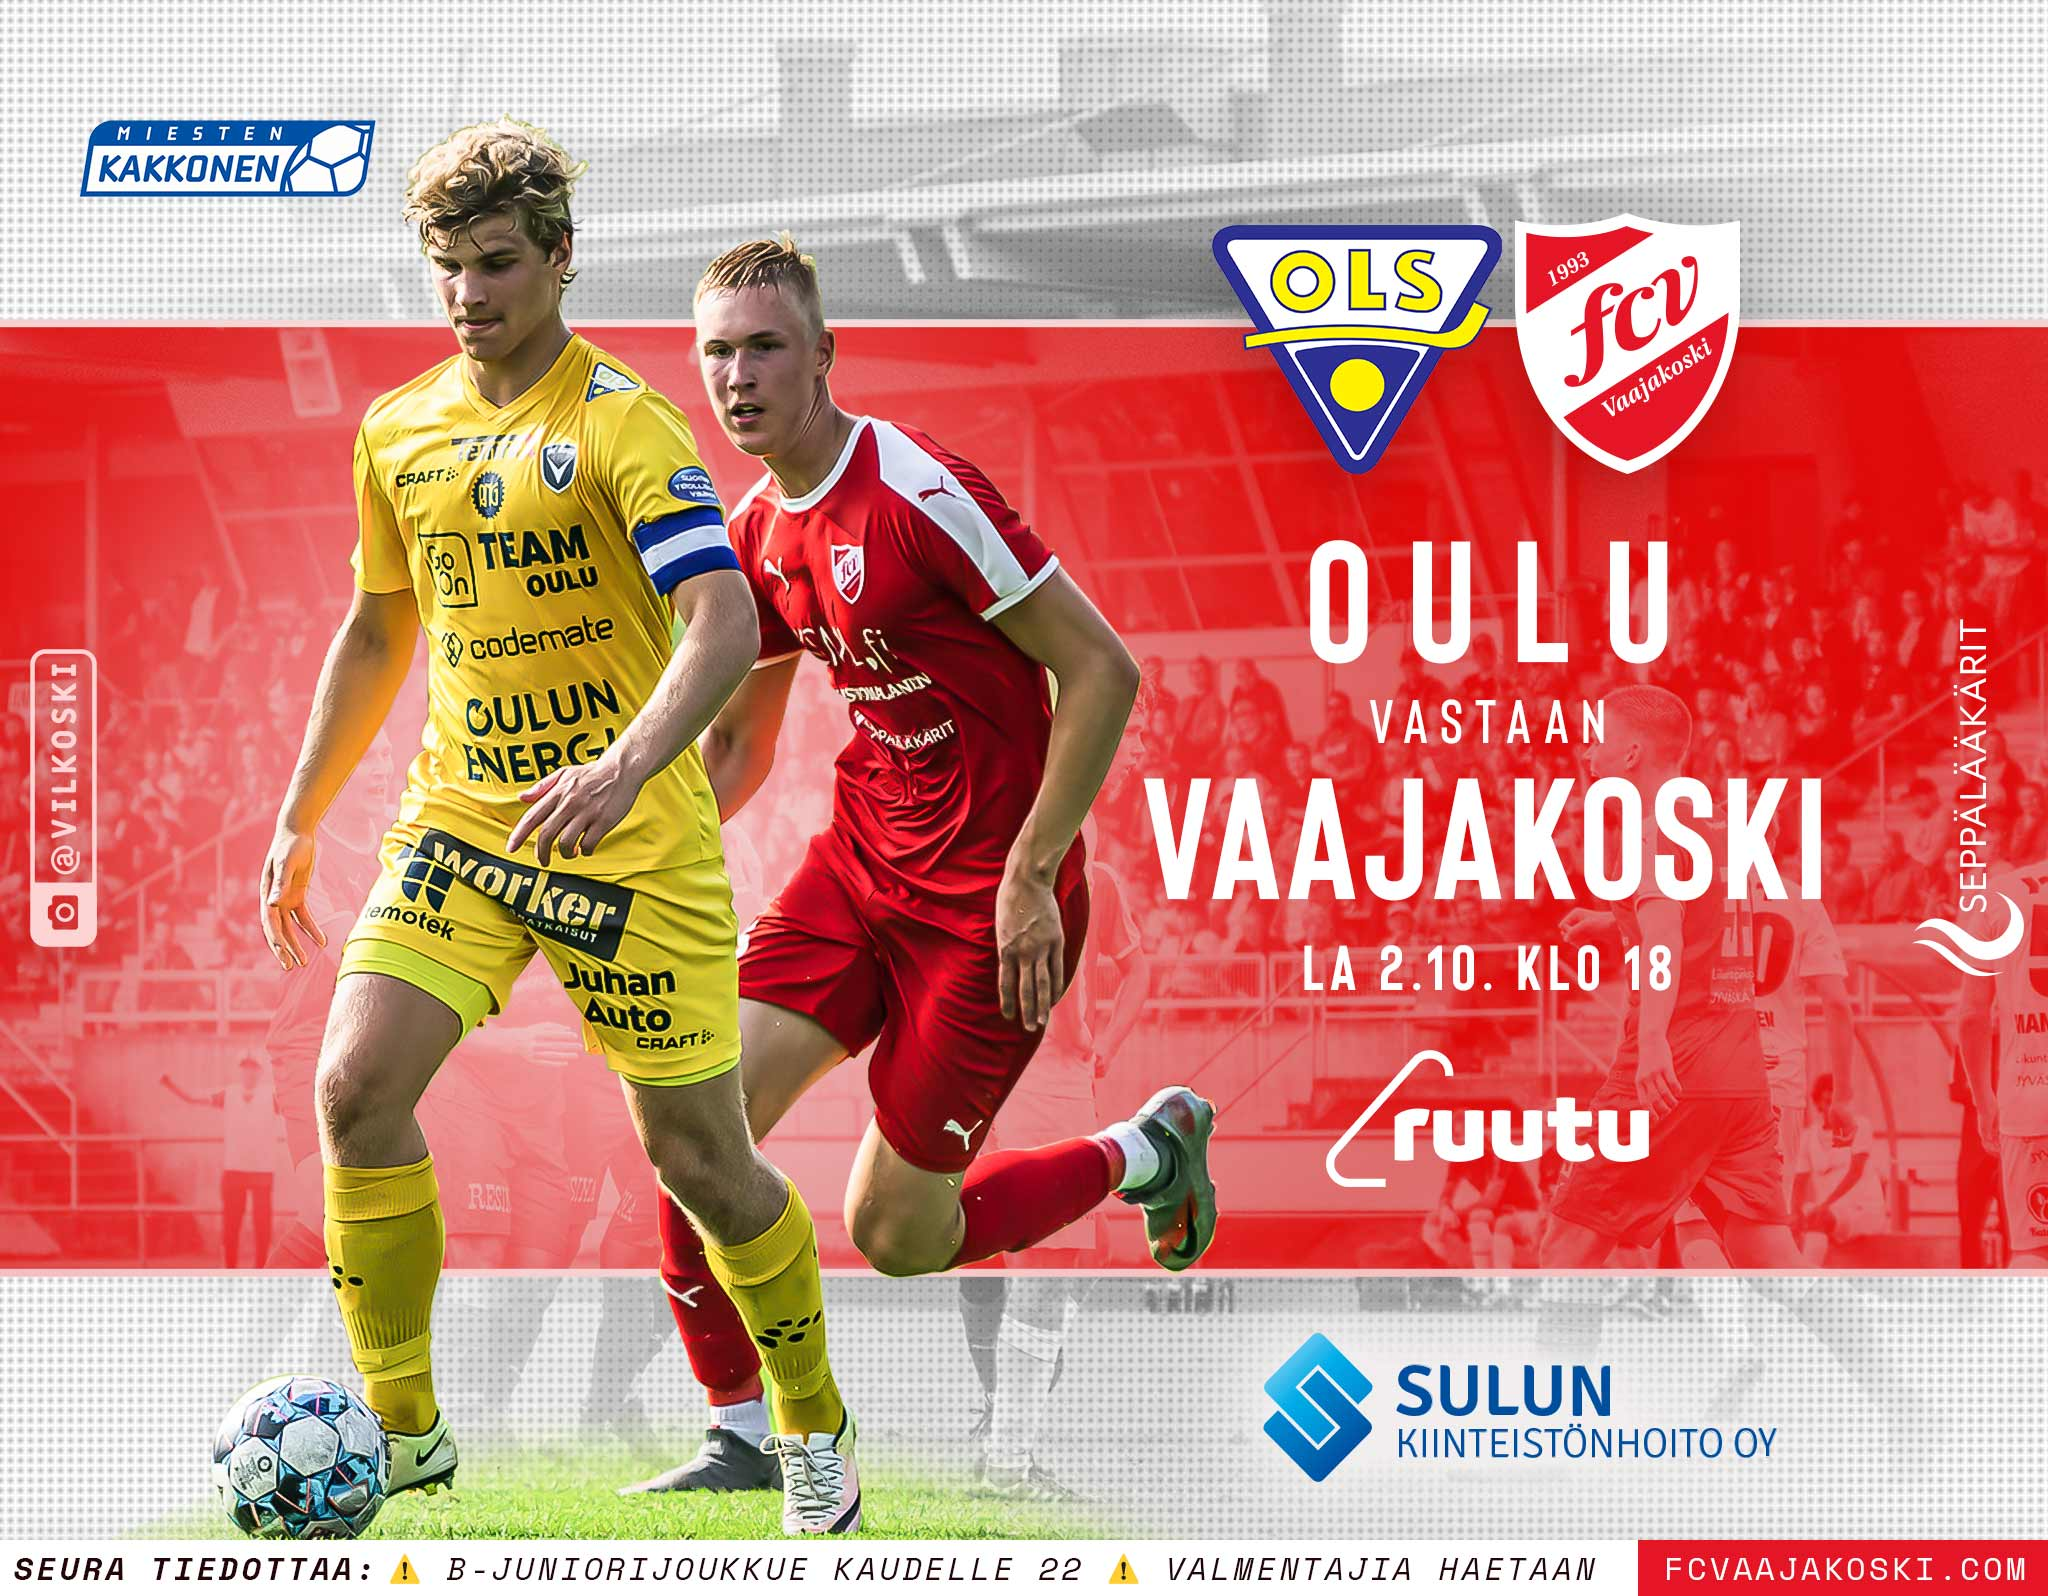 OLS v FC Vaajakoski